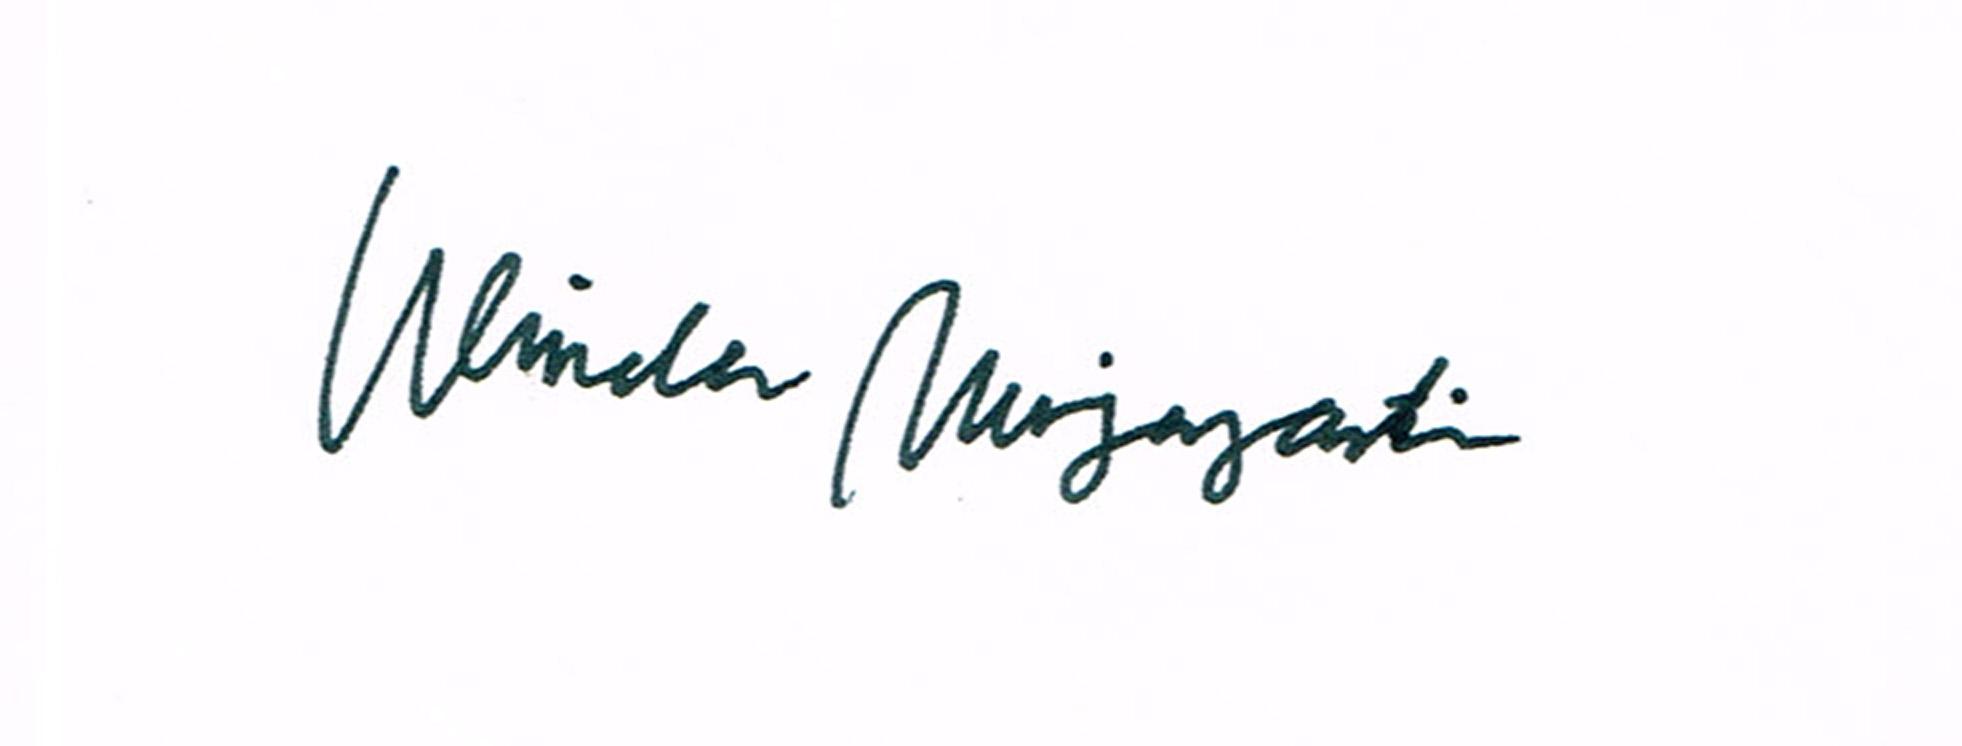 Winda Nurjayanti's Signature